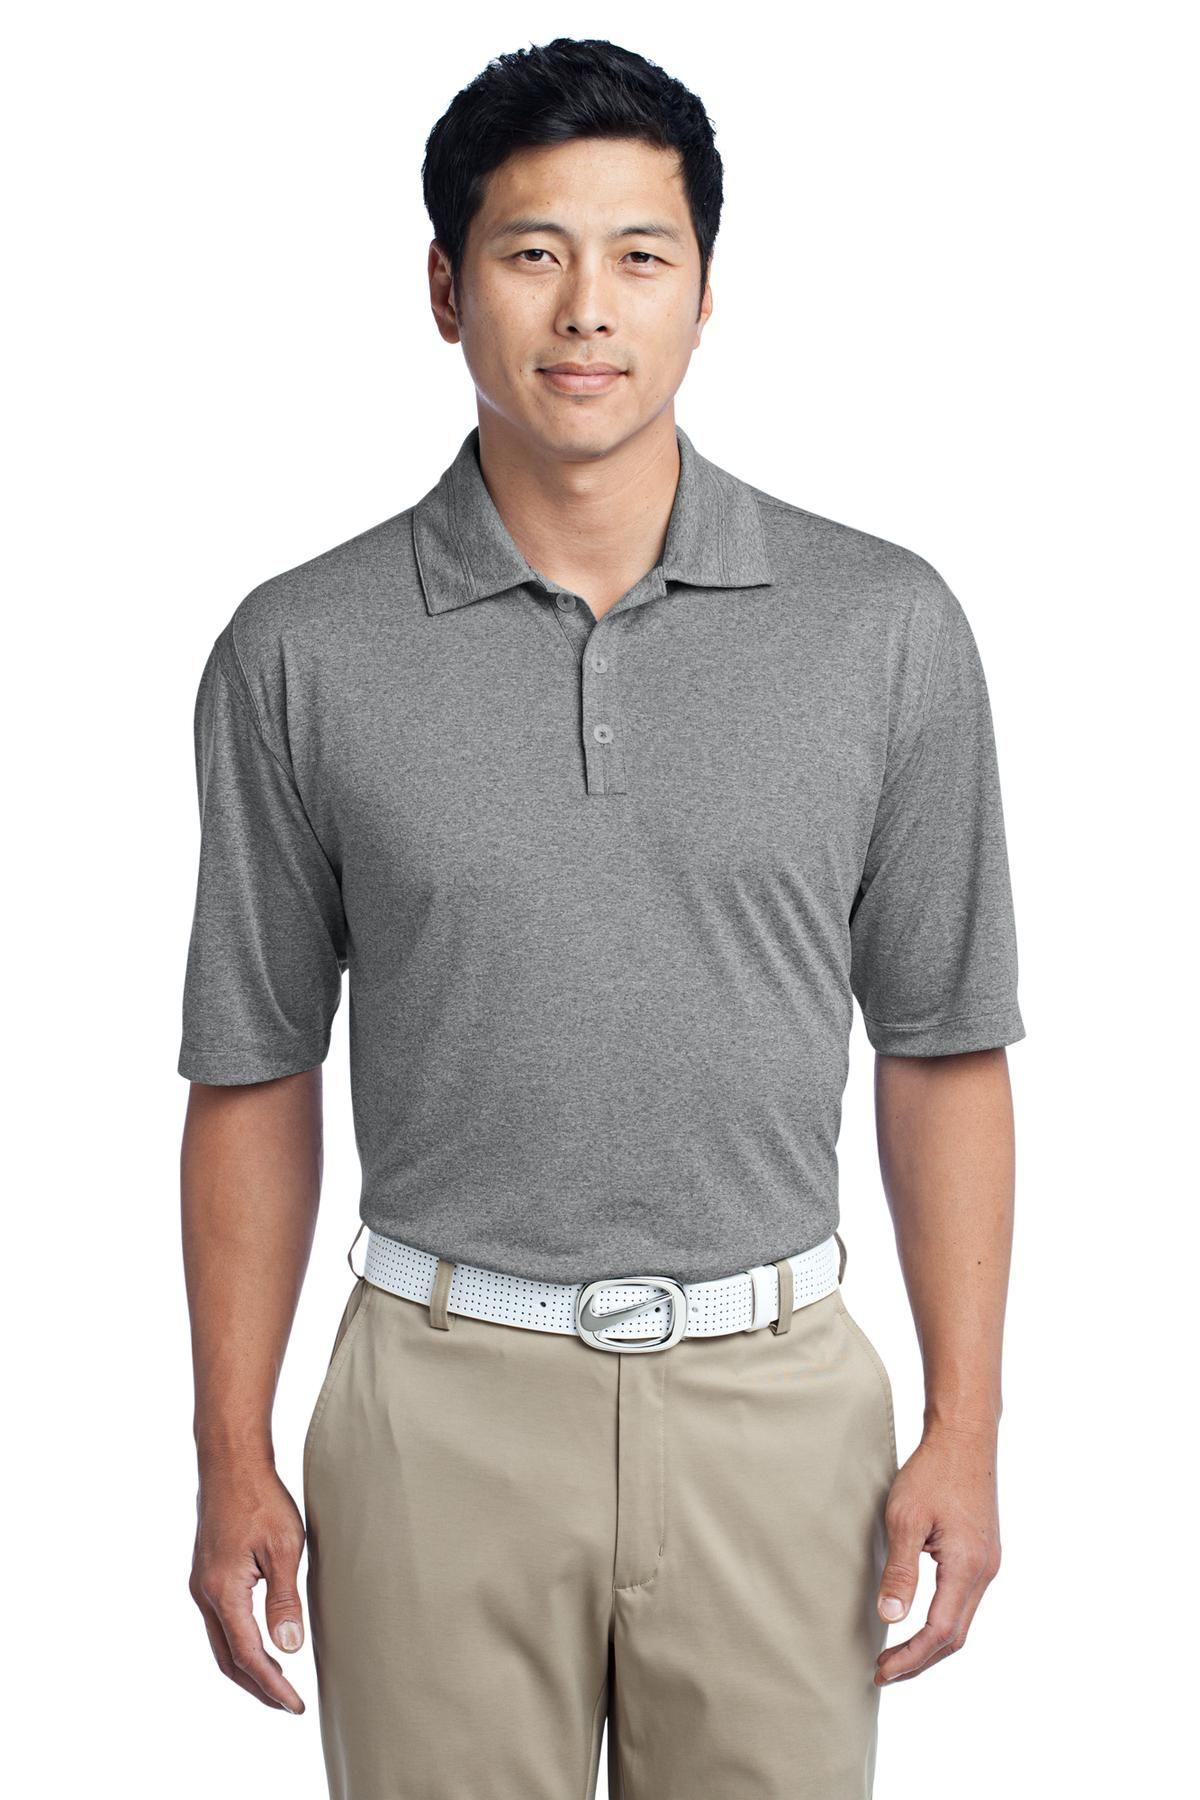 a4eea4fc3 SanMar - Wholesale Imprintable Apparel & Accessories | Shirts | Nike ...